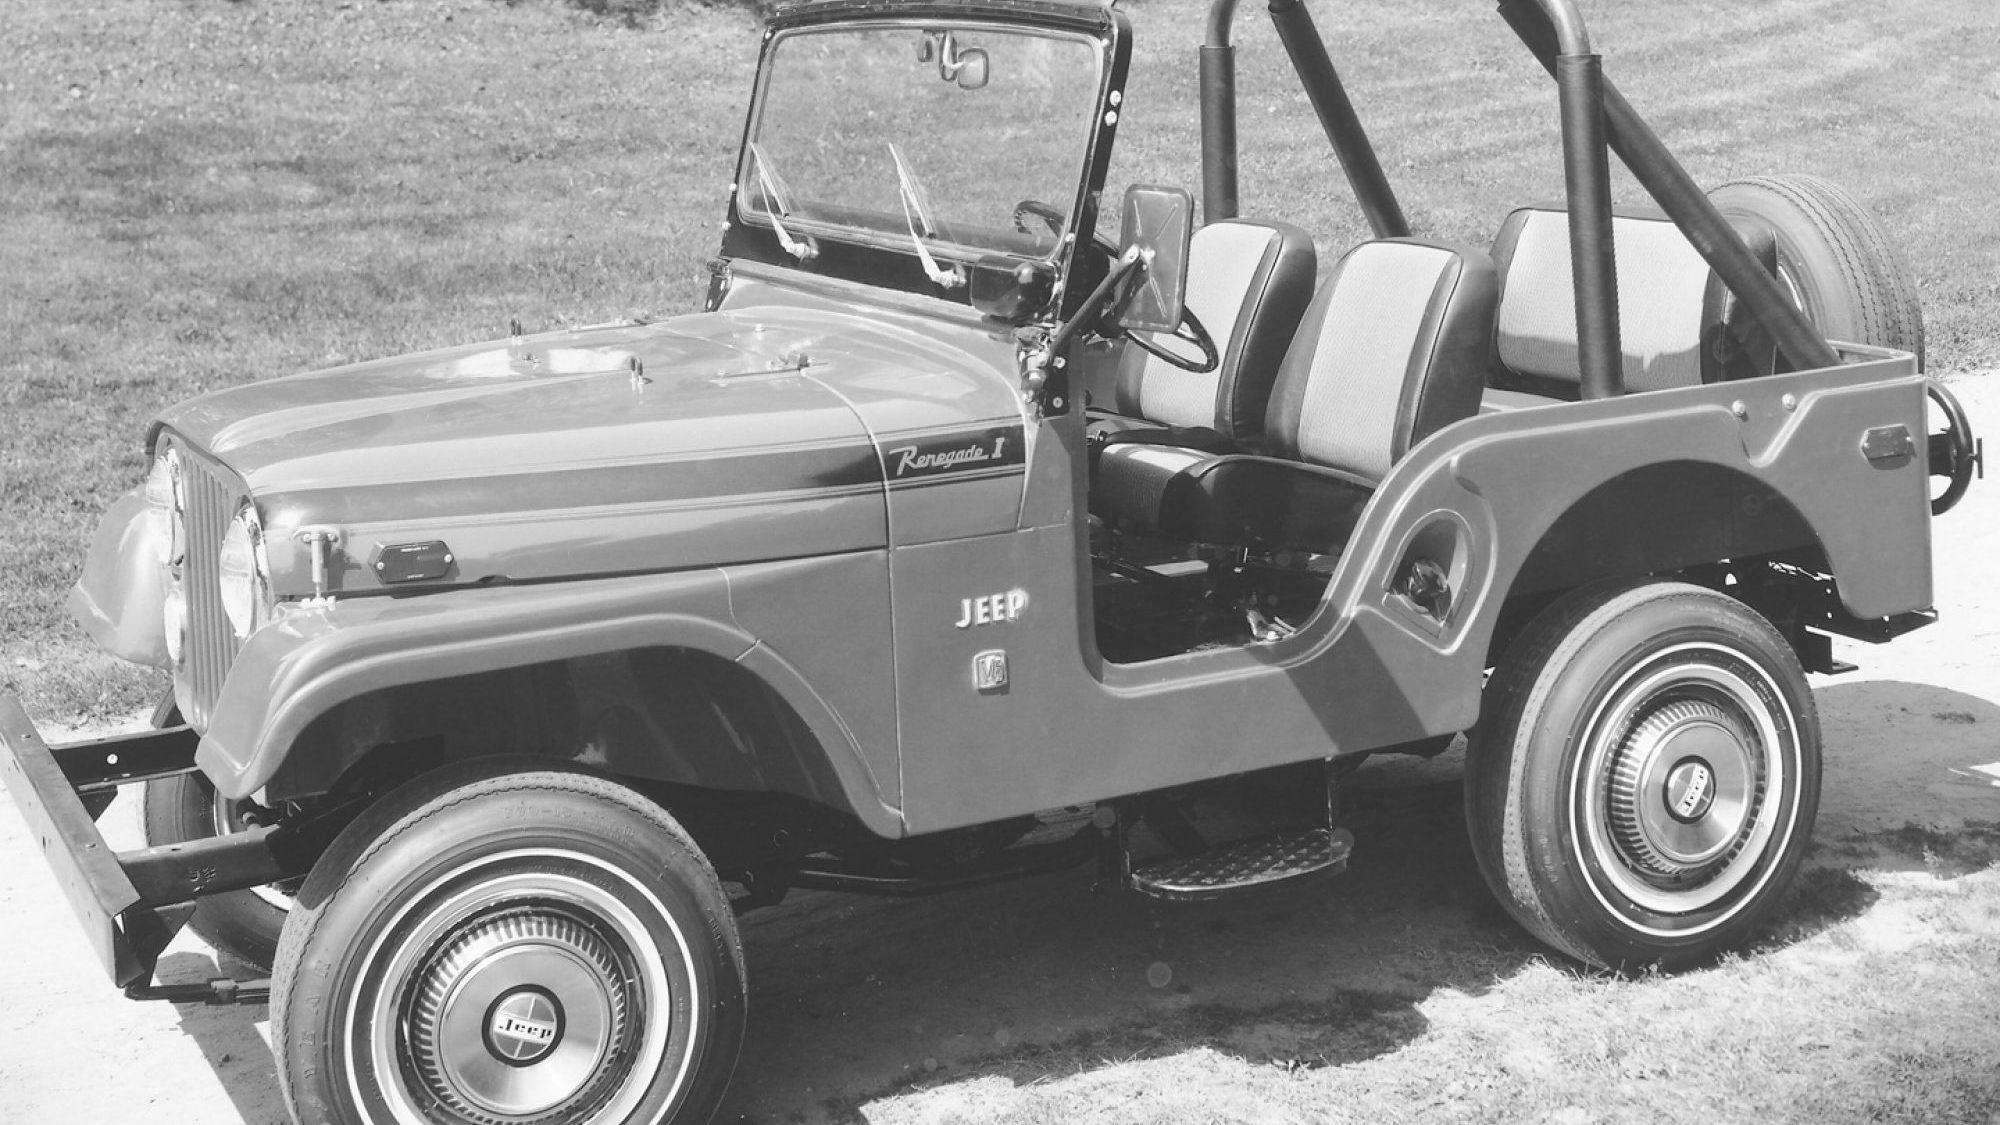 1970 Jeep CJ-5 Renegade I